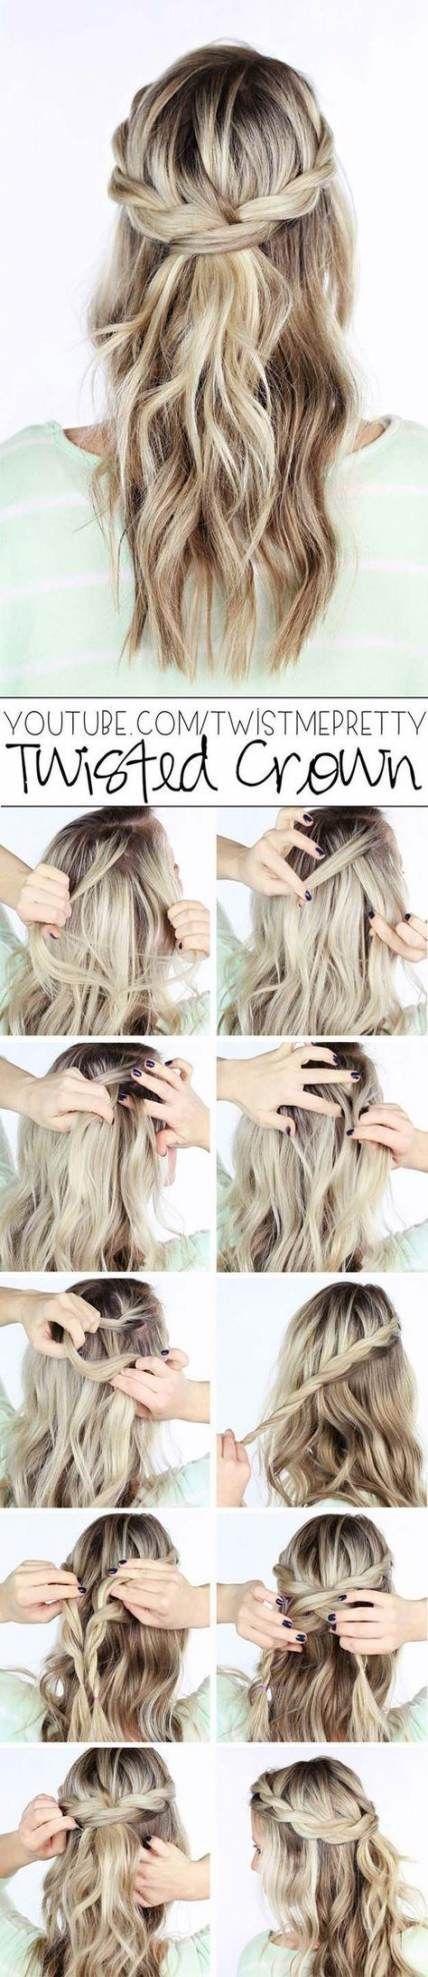 Hair Styles Bun Braid Top Knot 23+ New Ideas #braidedtopknots Hair Styles Bun Braid Top Knot 23+ New Ideas #hair #braidedtopknots Hair Styles Bun Braid Top Knot 23+ New Ideas #braidedtopknots Hair Styles Bun Braid Top Knot 23+ New Ideas #hair #braidedtopknots Hair Styles Bun Braid Top Knot 23+ New Ideas #braidedtopknots Hair Styles Bun Braid Top Knot 23+ New Ideas #hair #braidedtopknots Hair Styles Bun Braid Top Knot 23+ New Ideas #braidedtopknots Hair Styles Bun Braid Top Knot 23+ New Ideas #ha #braidedtopknots